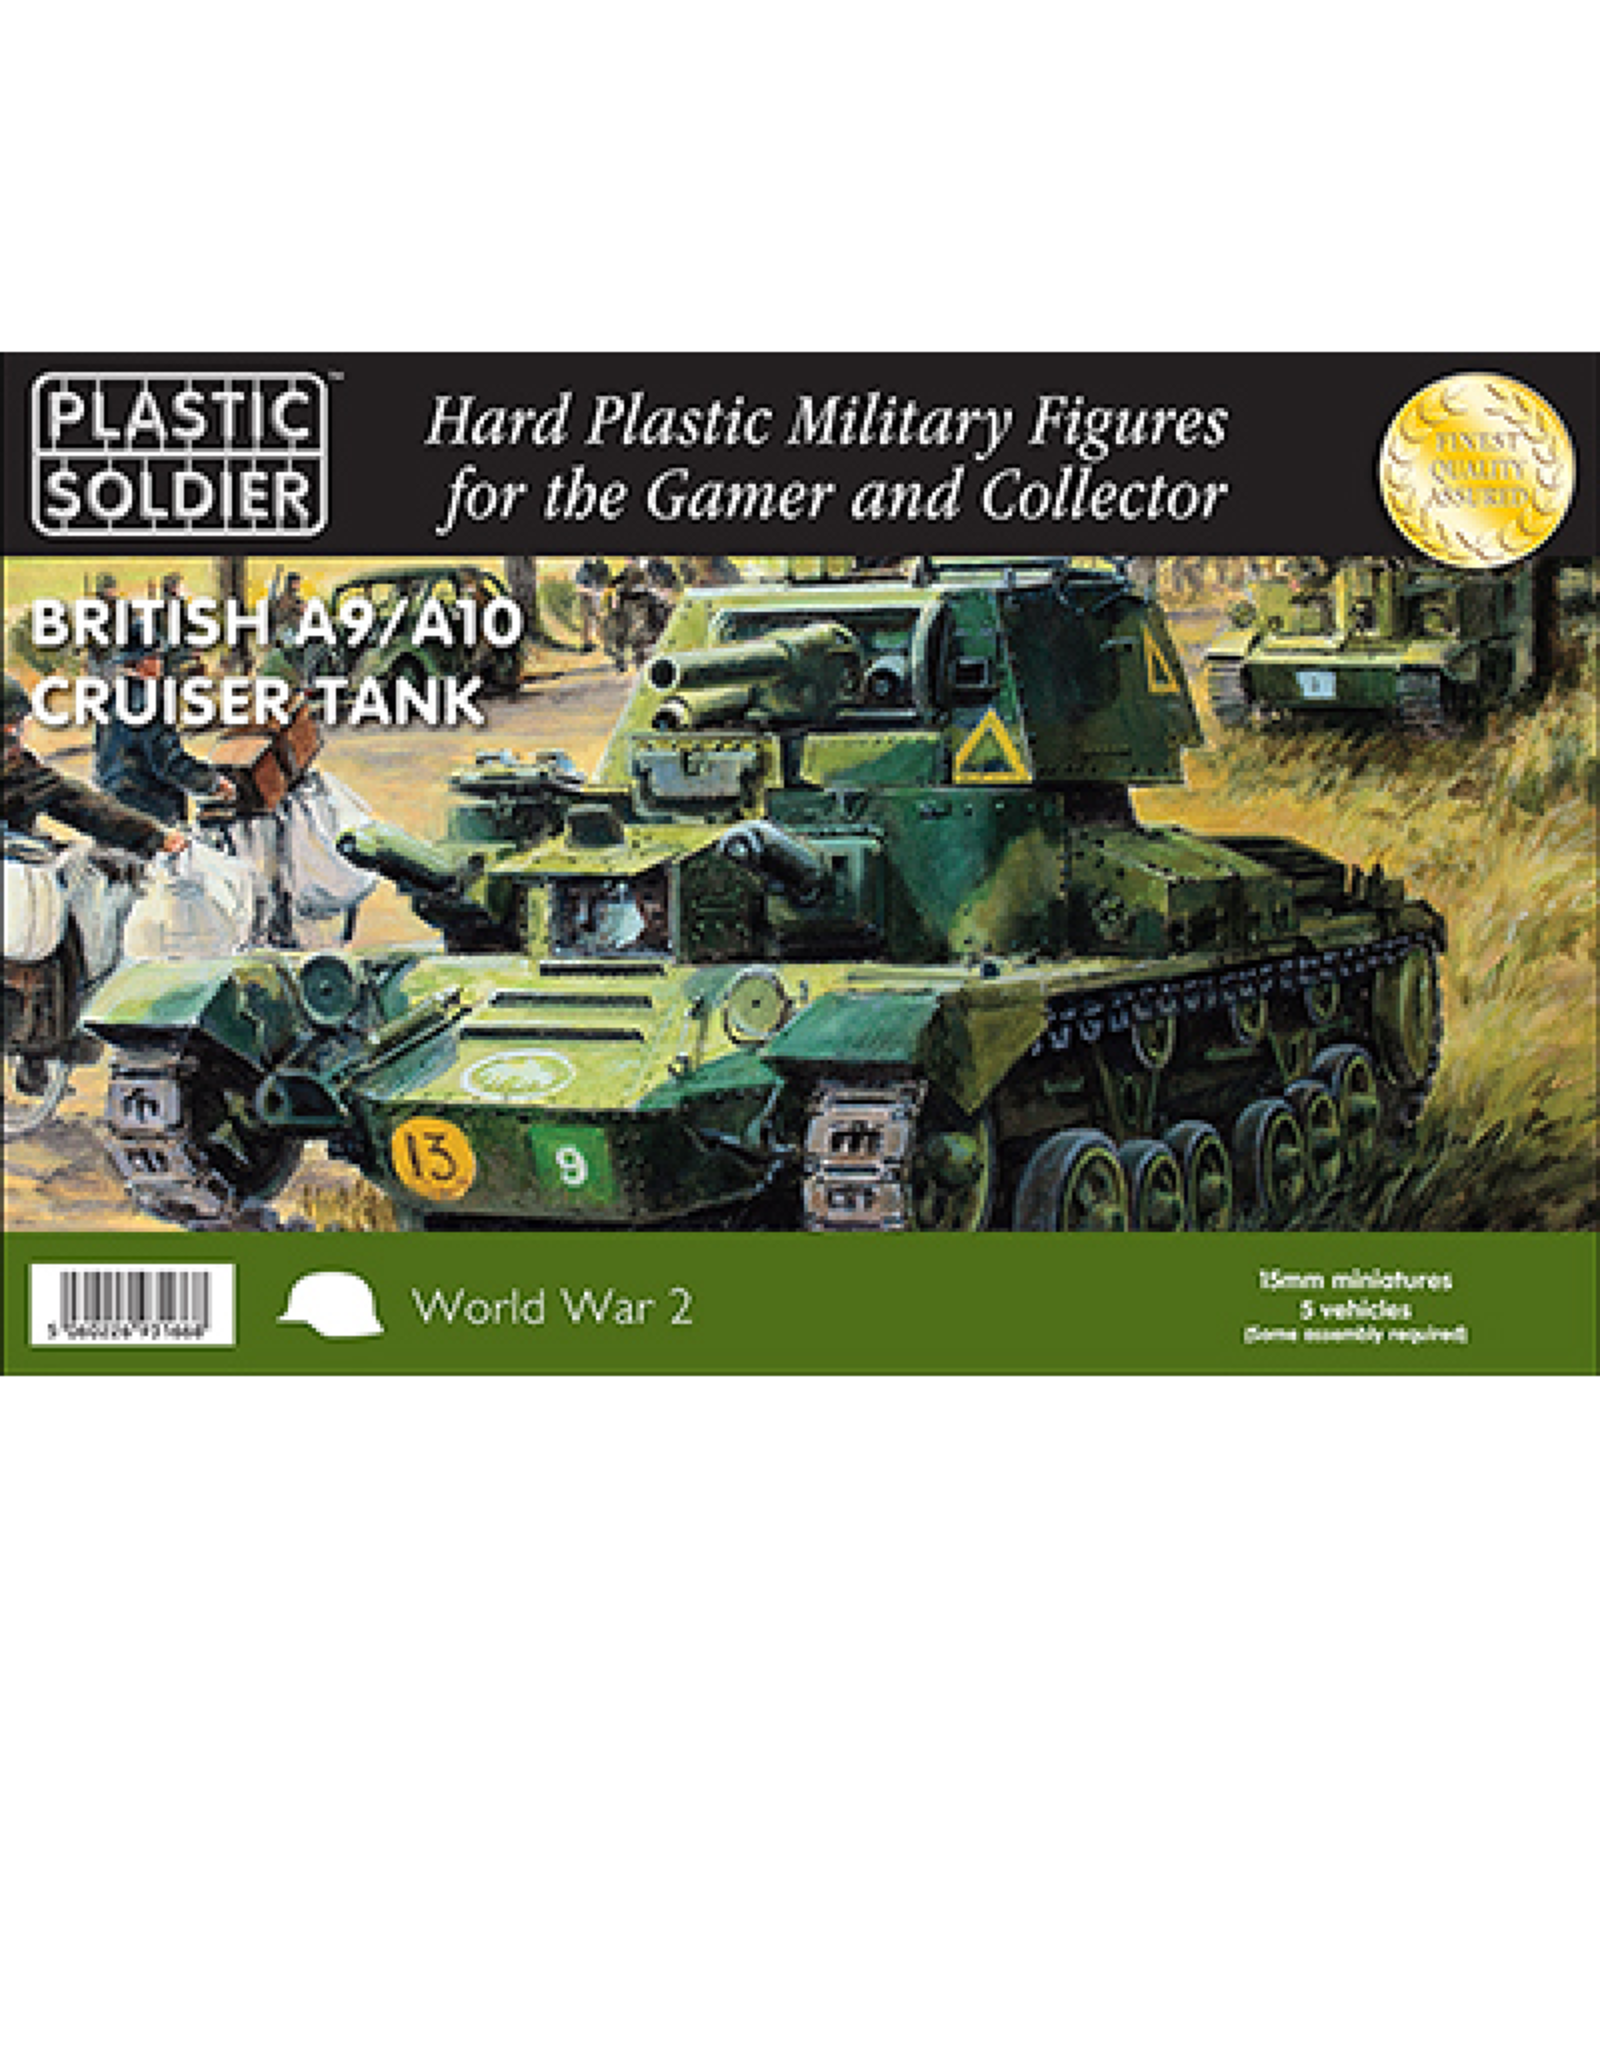 Plastic Soldier Company A9/A10 Cruiser Tank